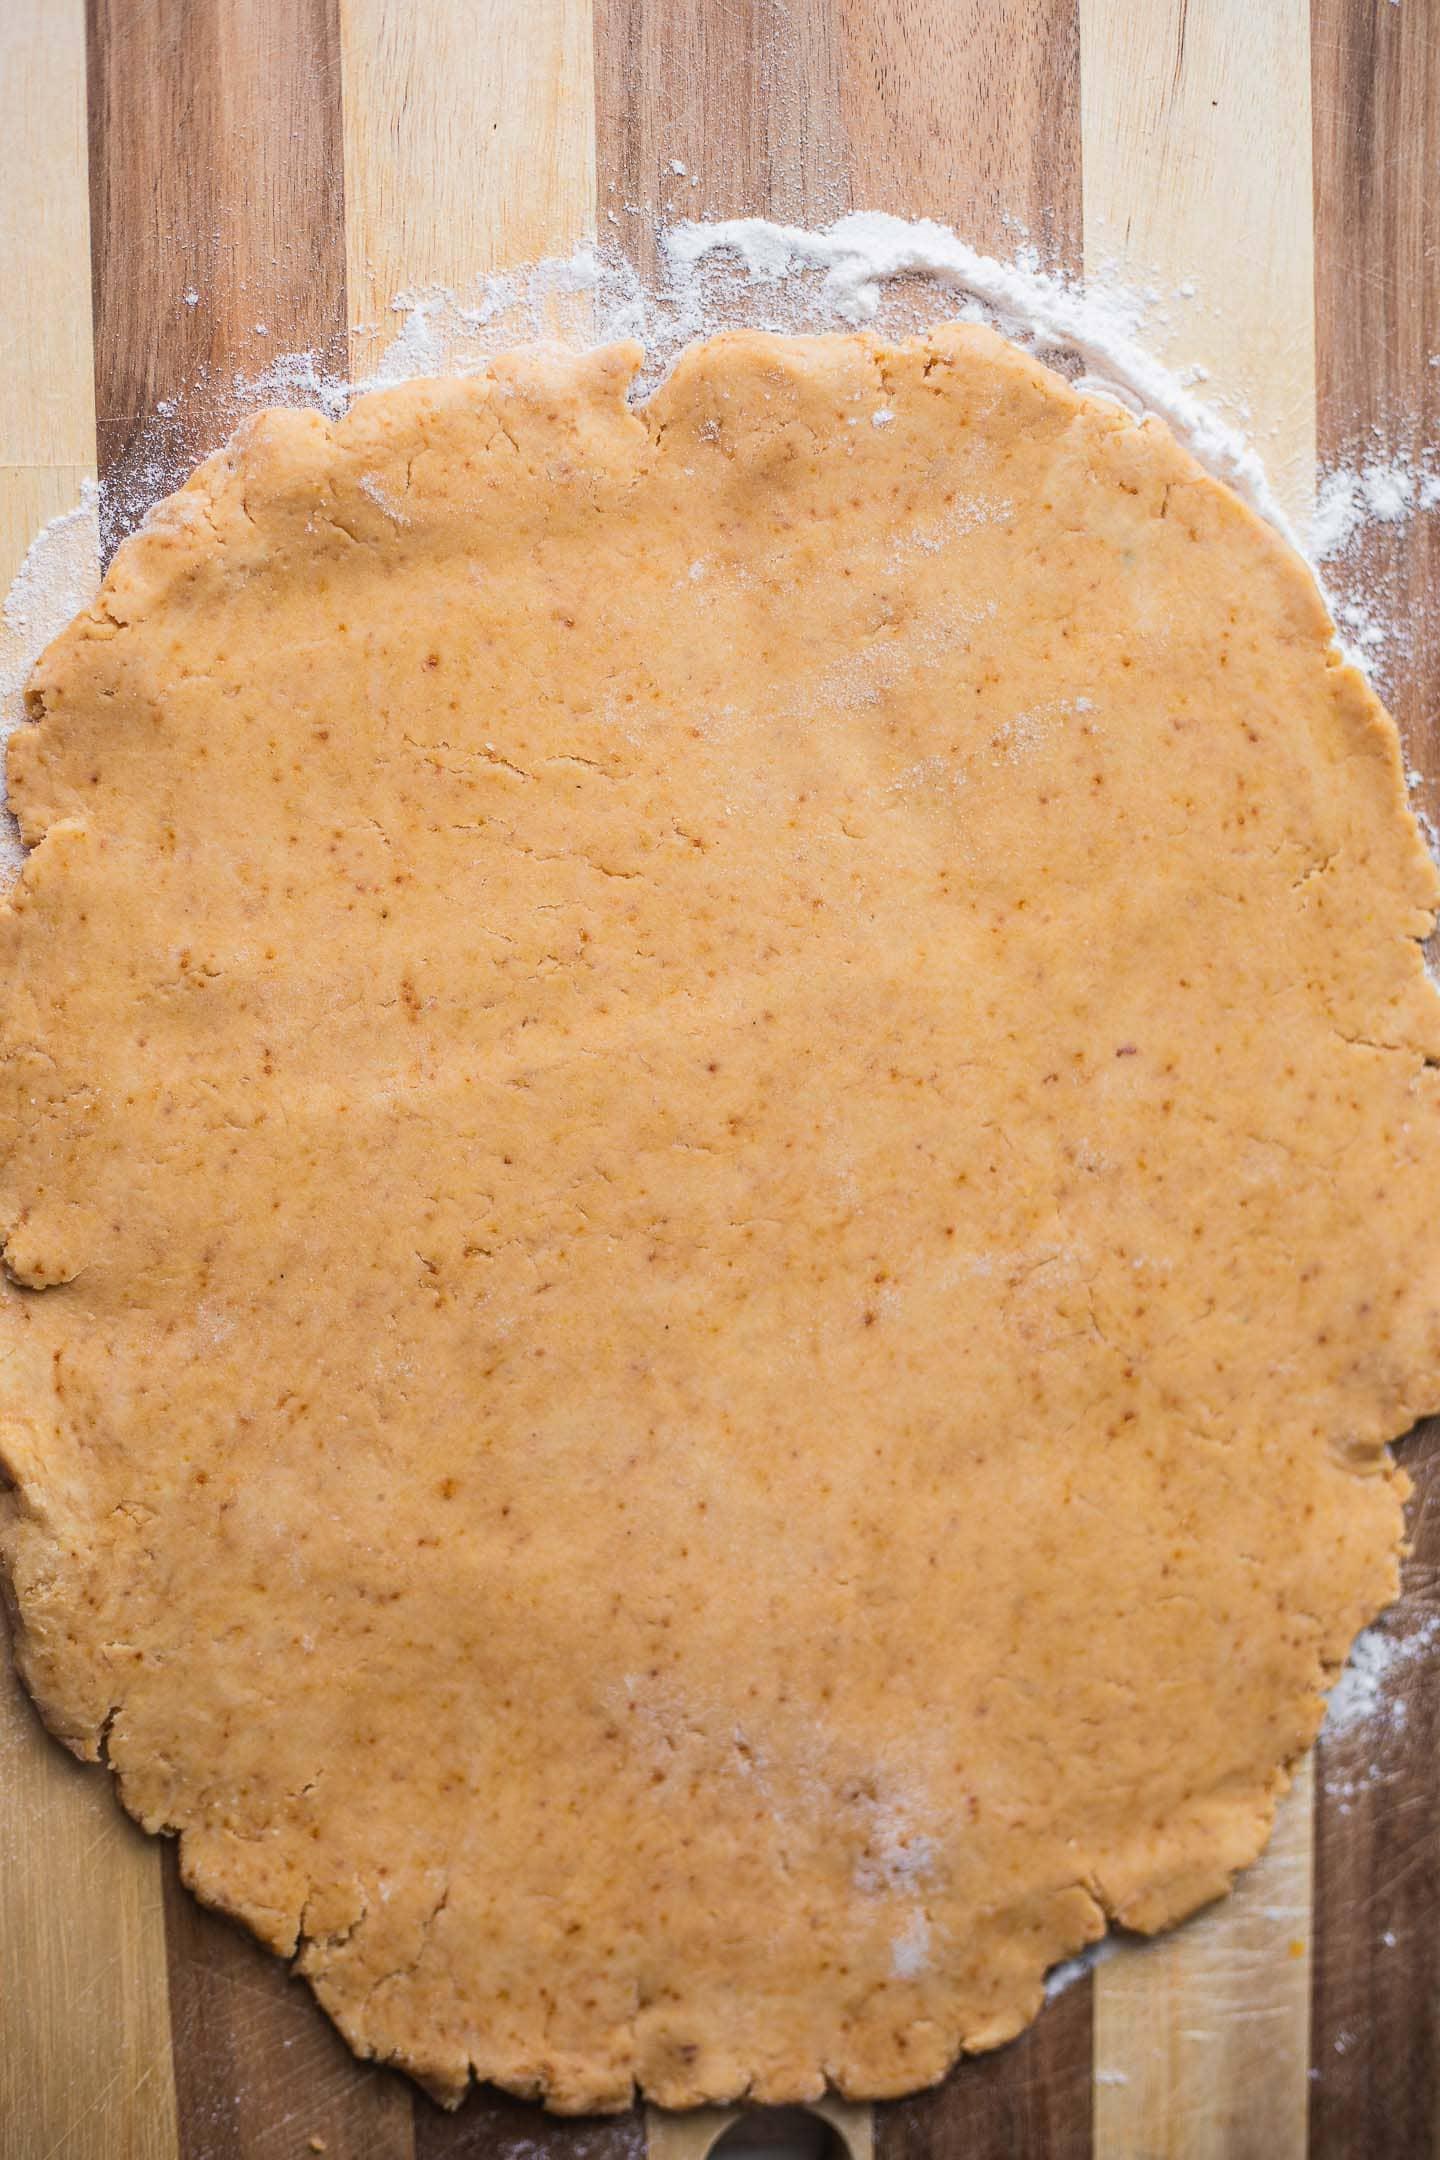 Pie crust dough on a wooden board